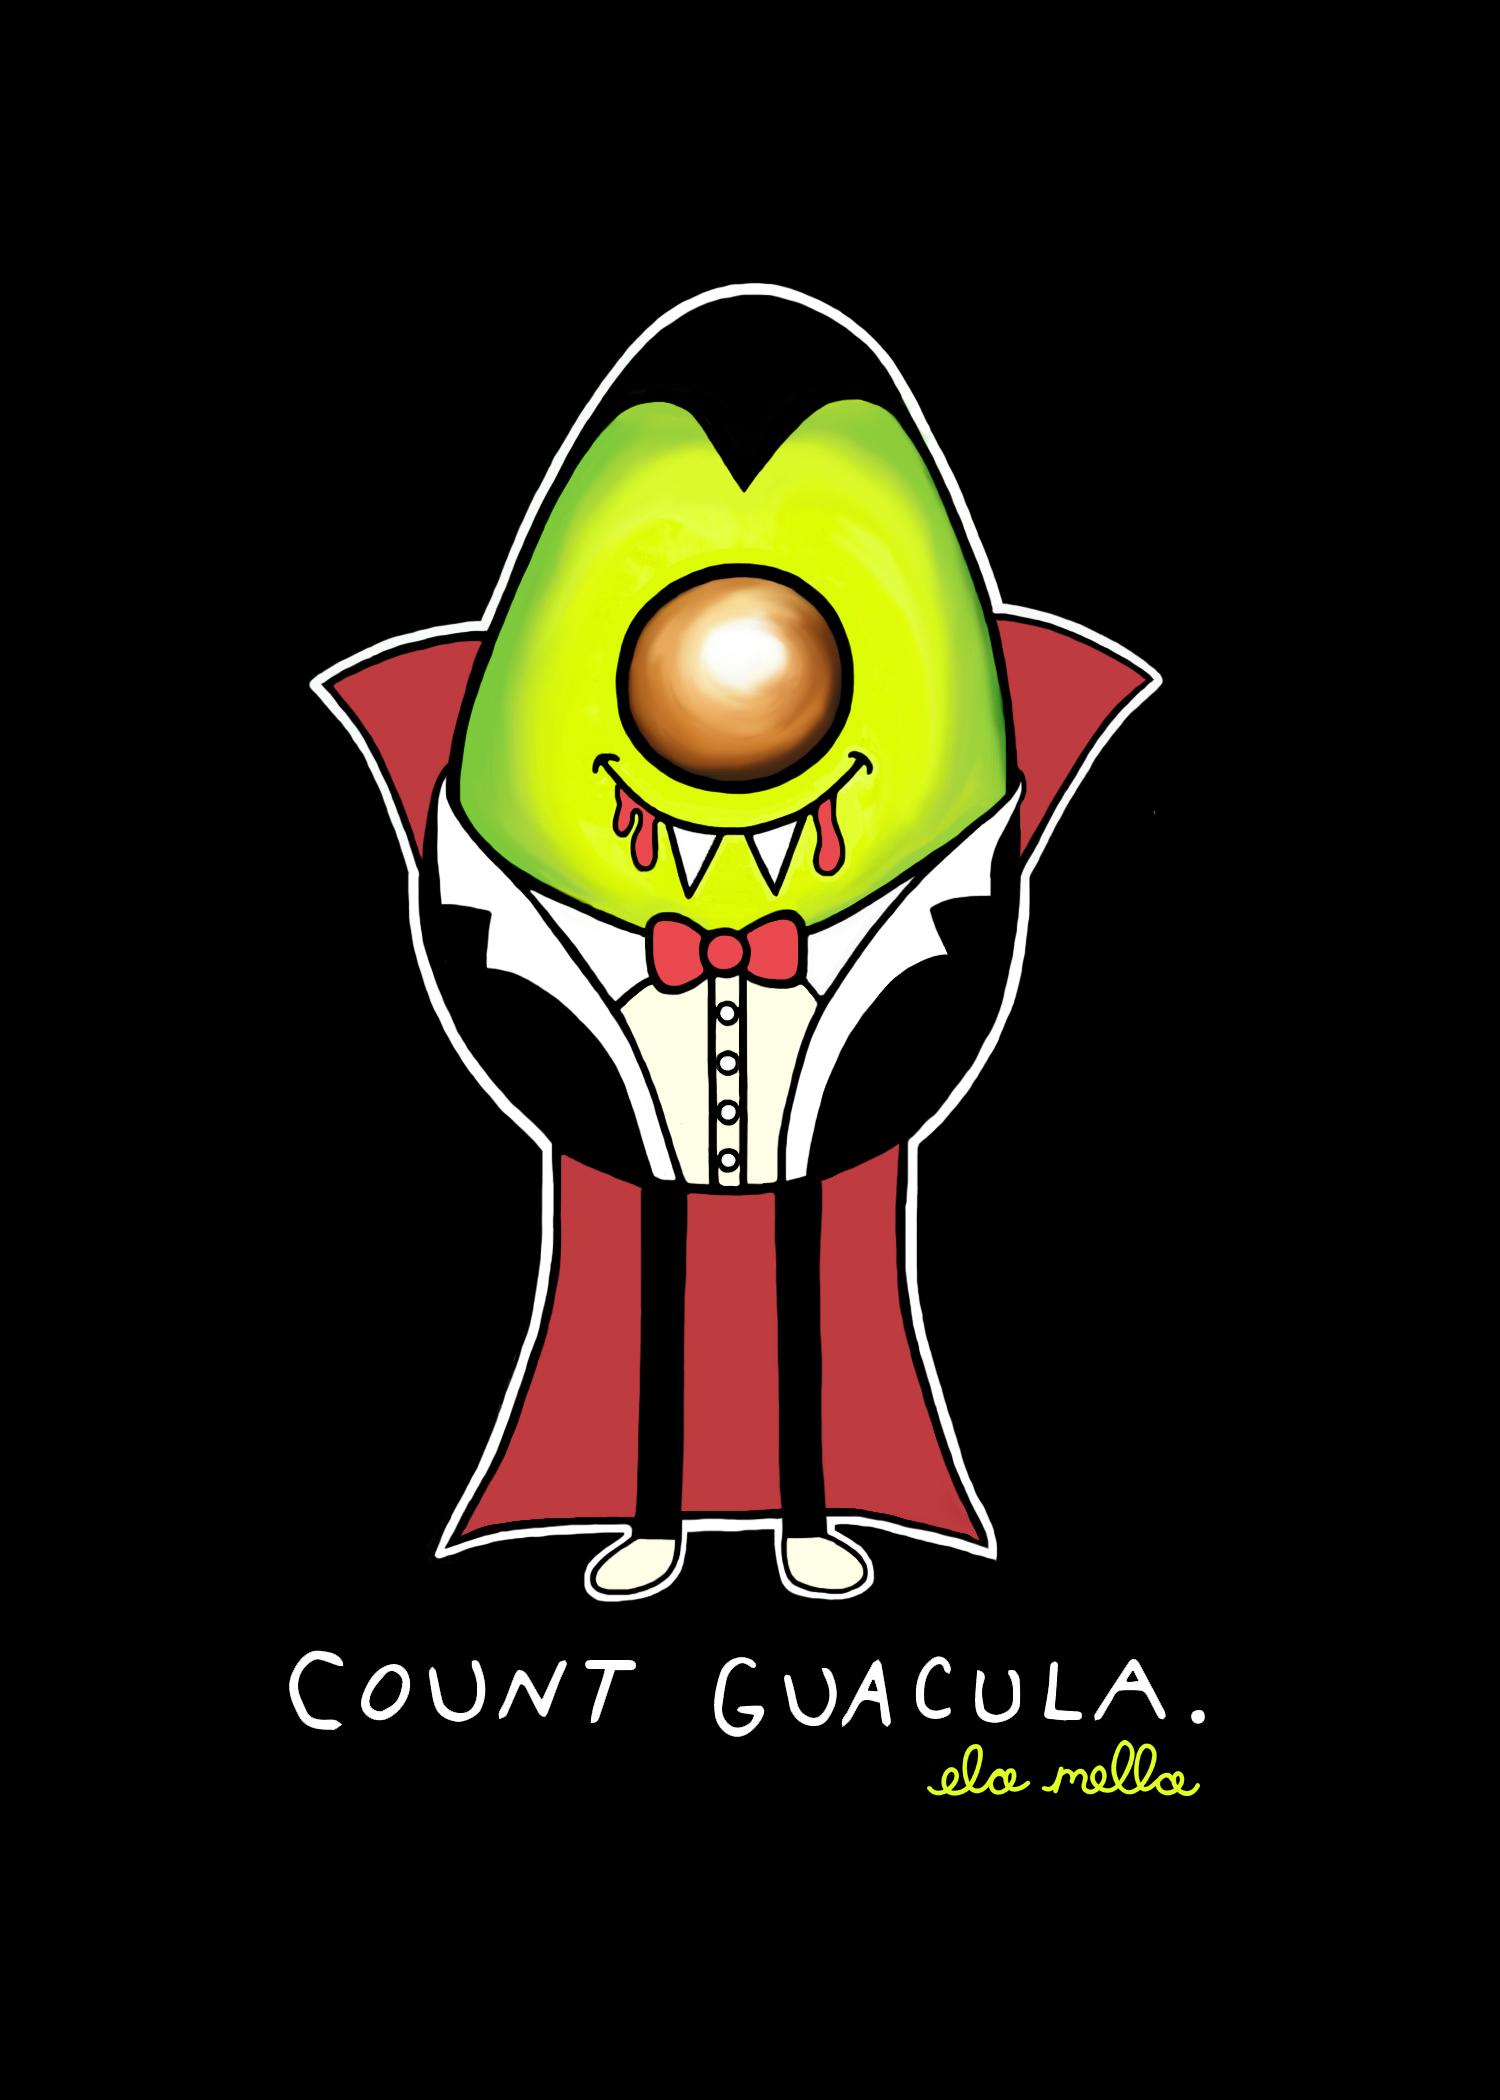 countguacula 5x7.jpg